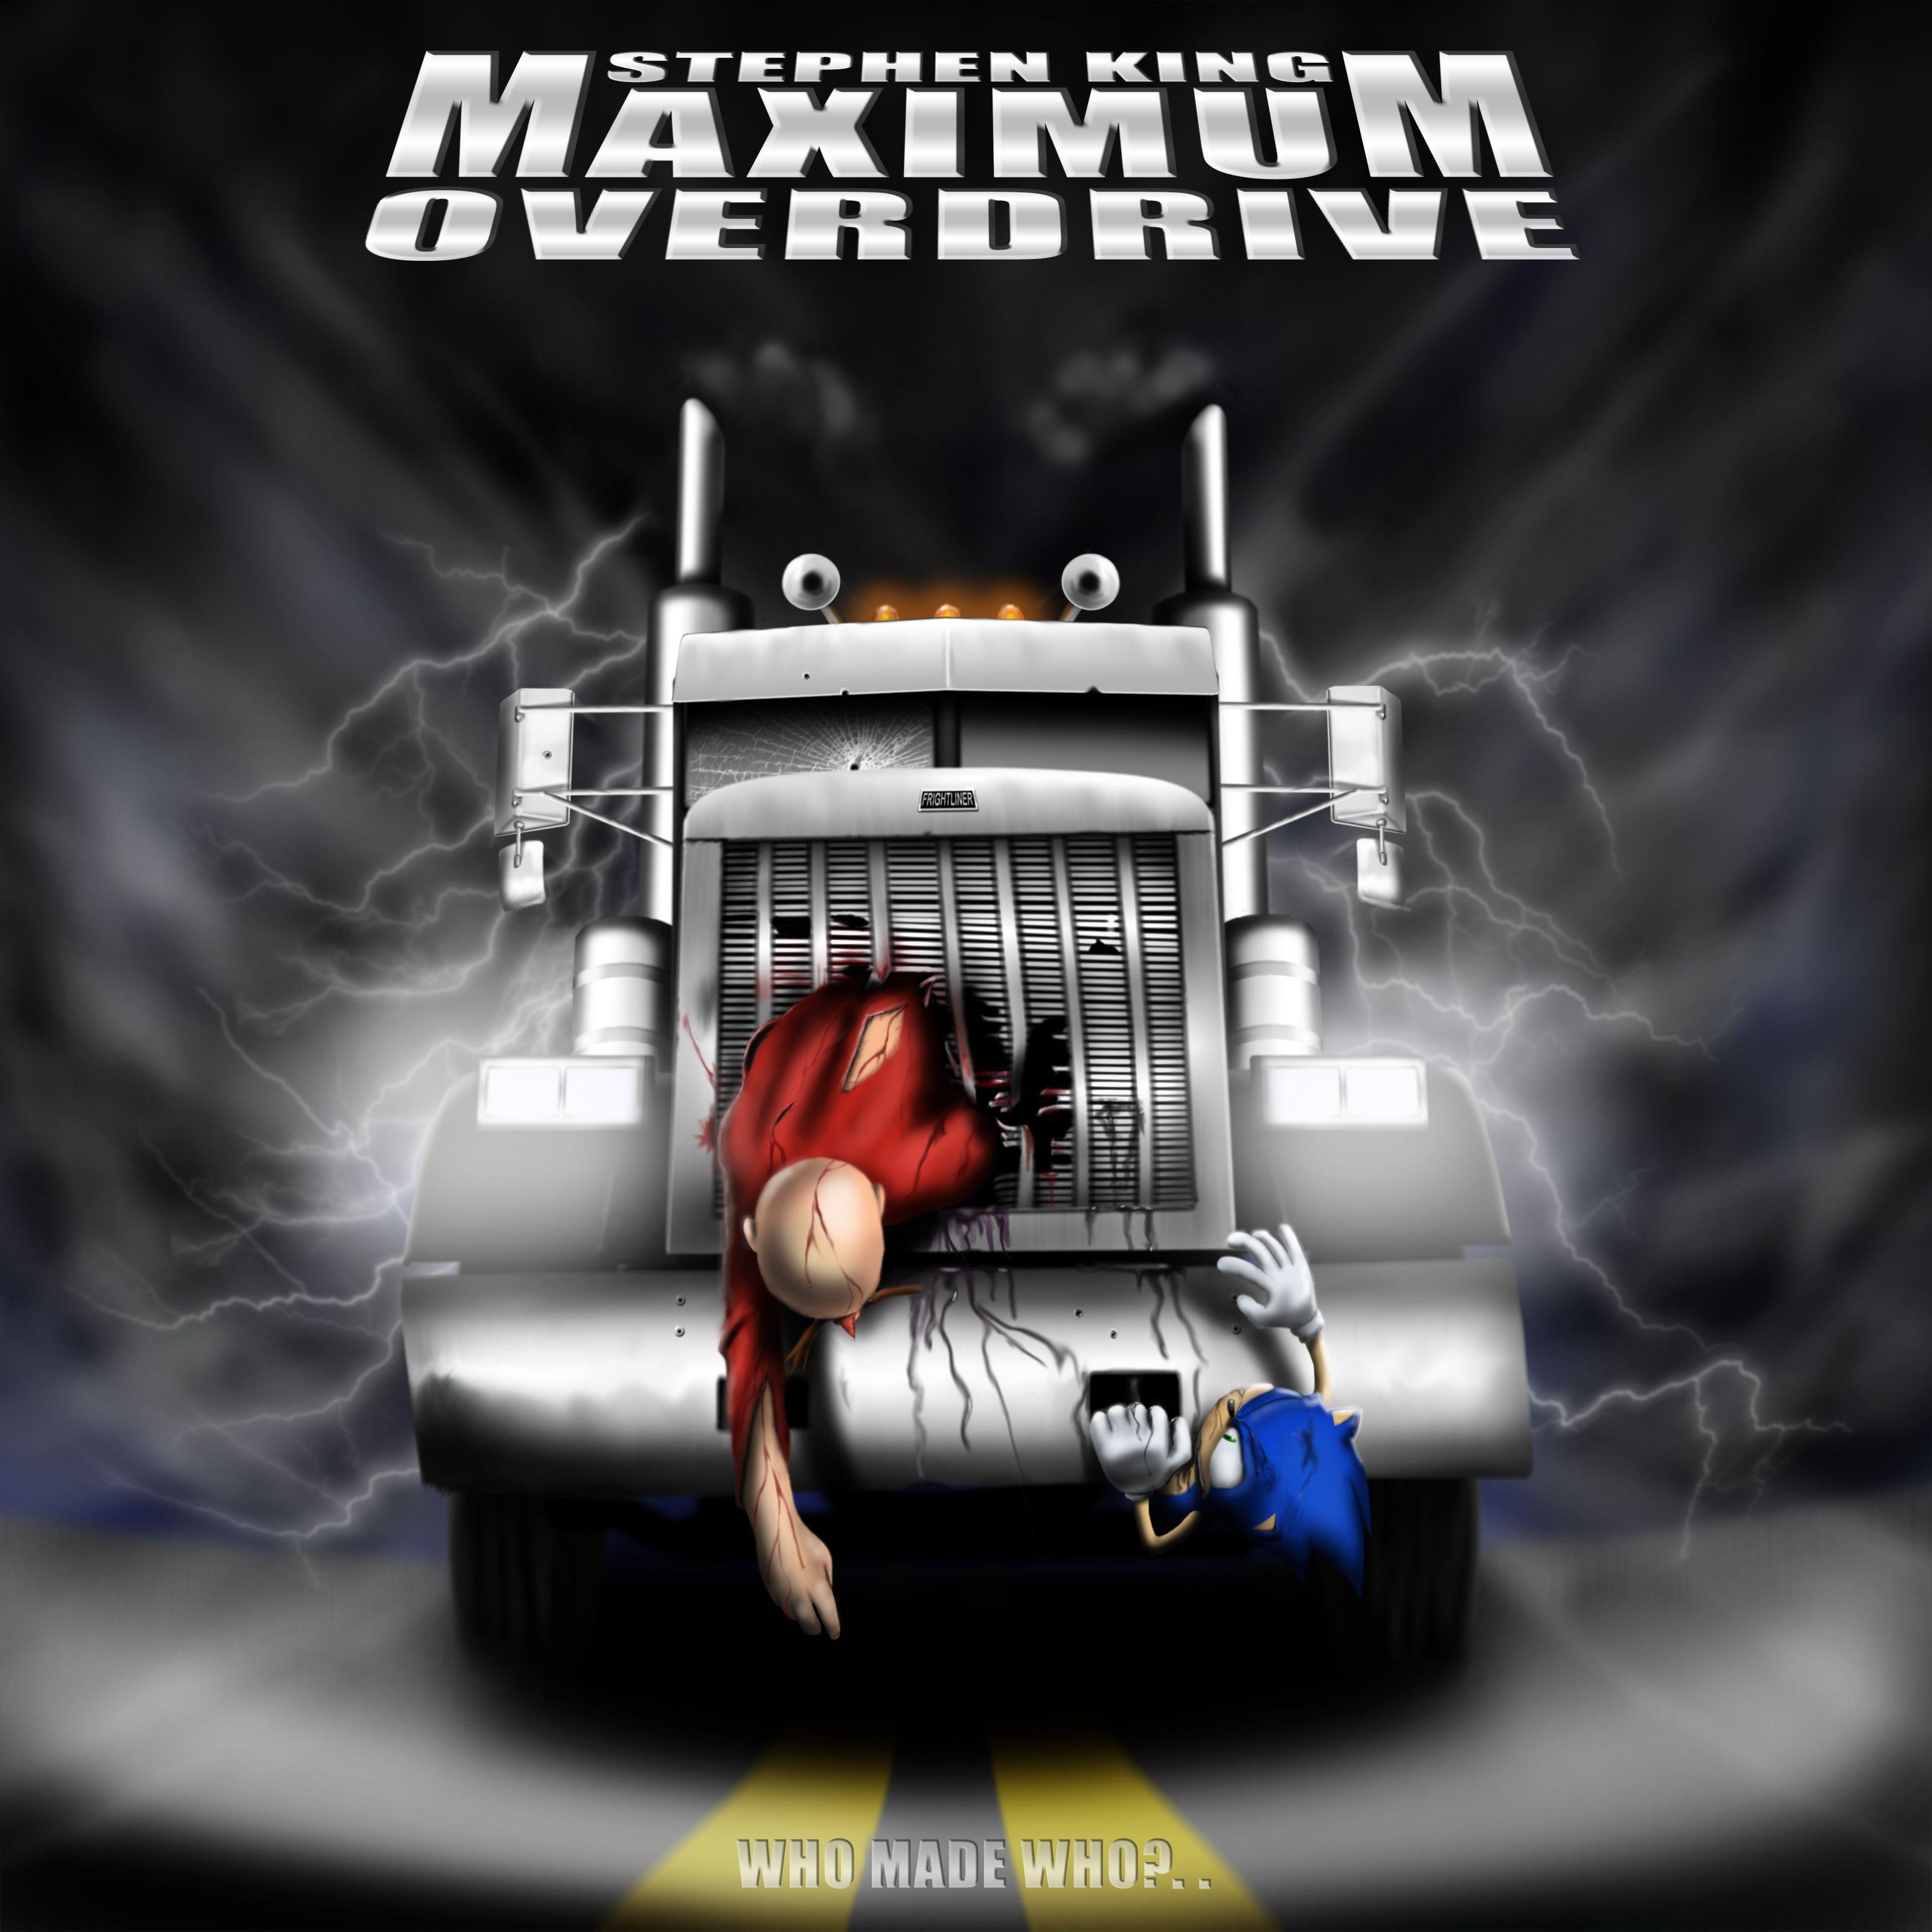 DeviantArt More Like Maximum Overdrive by GobboSparviero